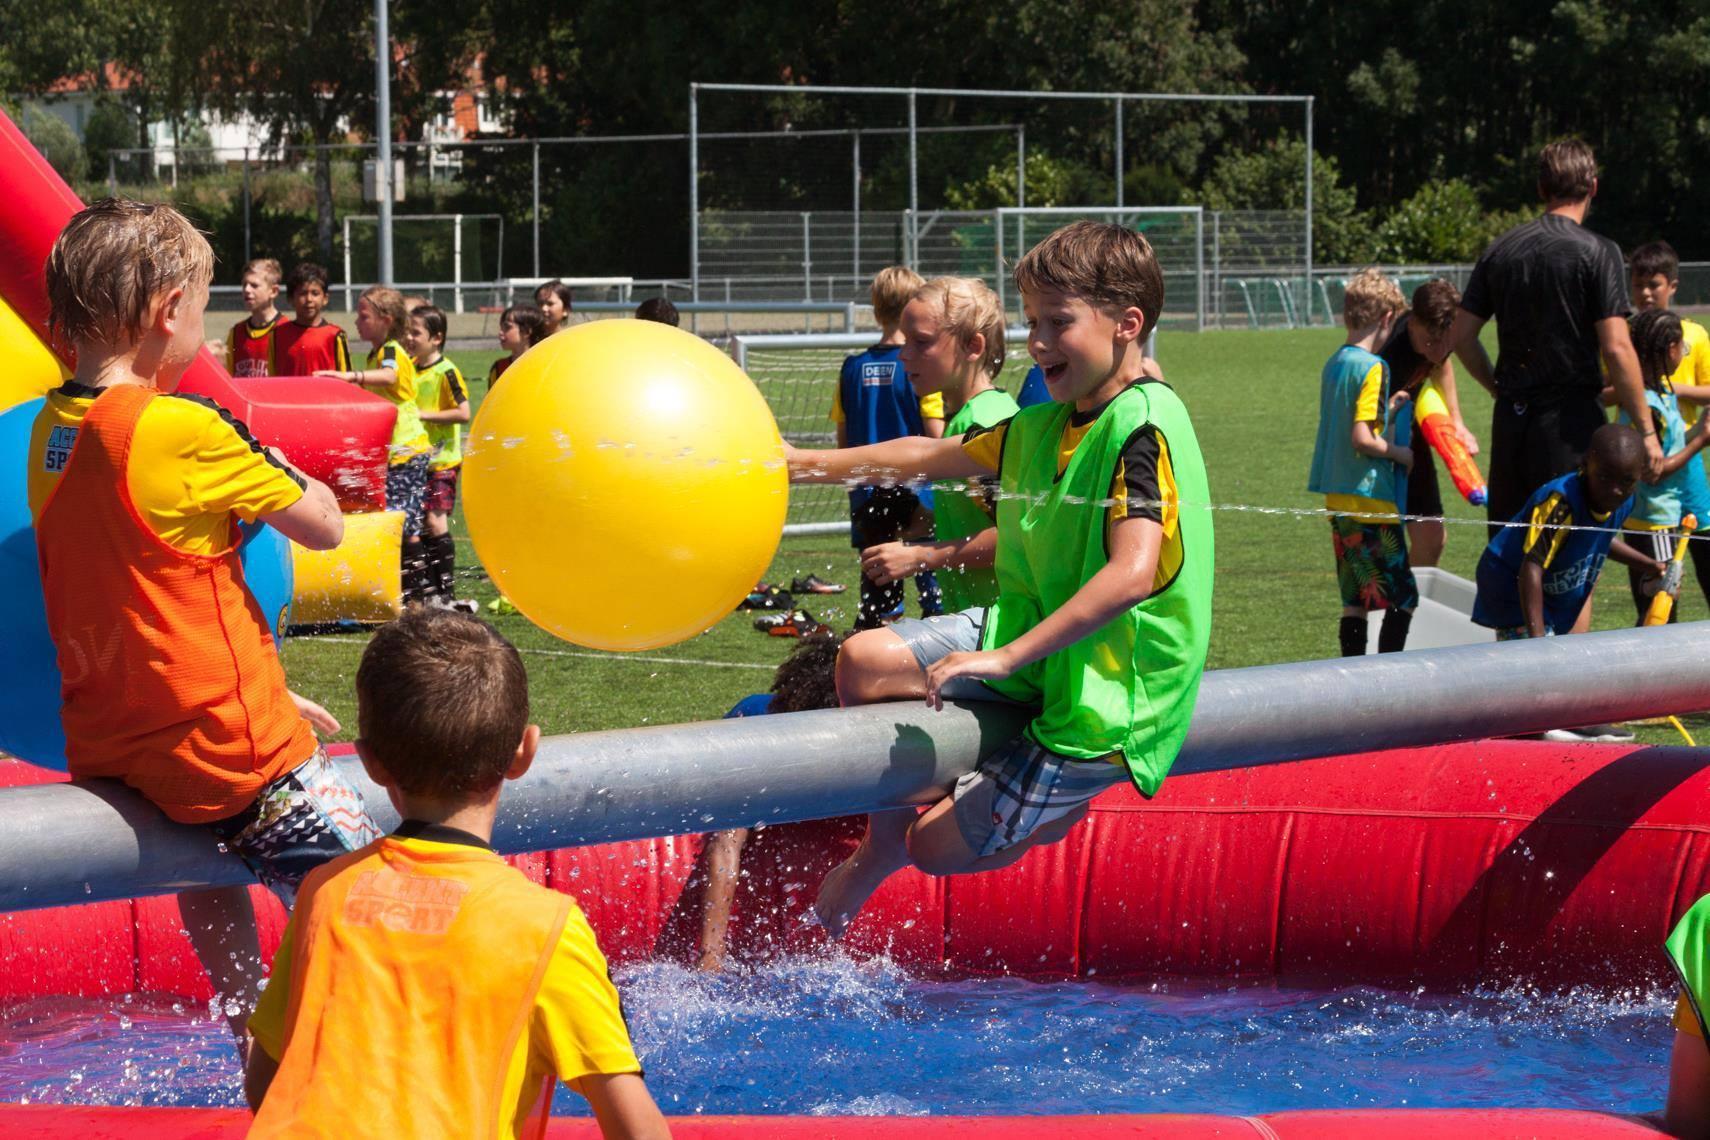 Waterdag camp